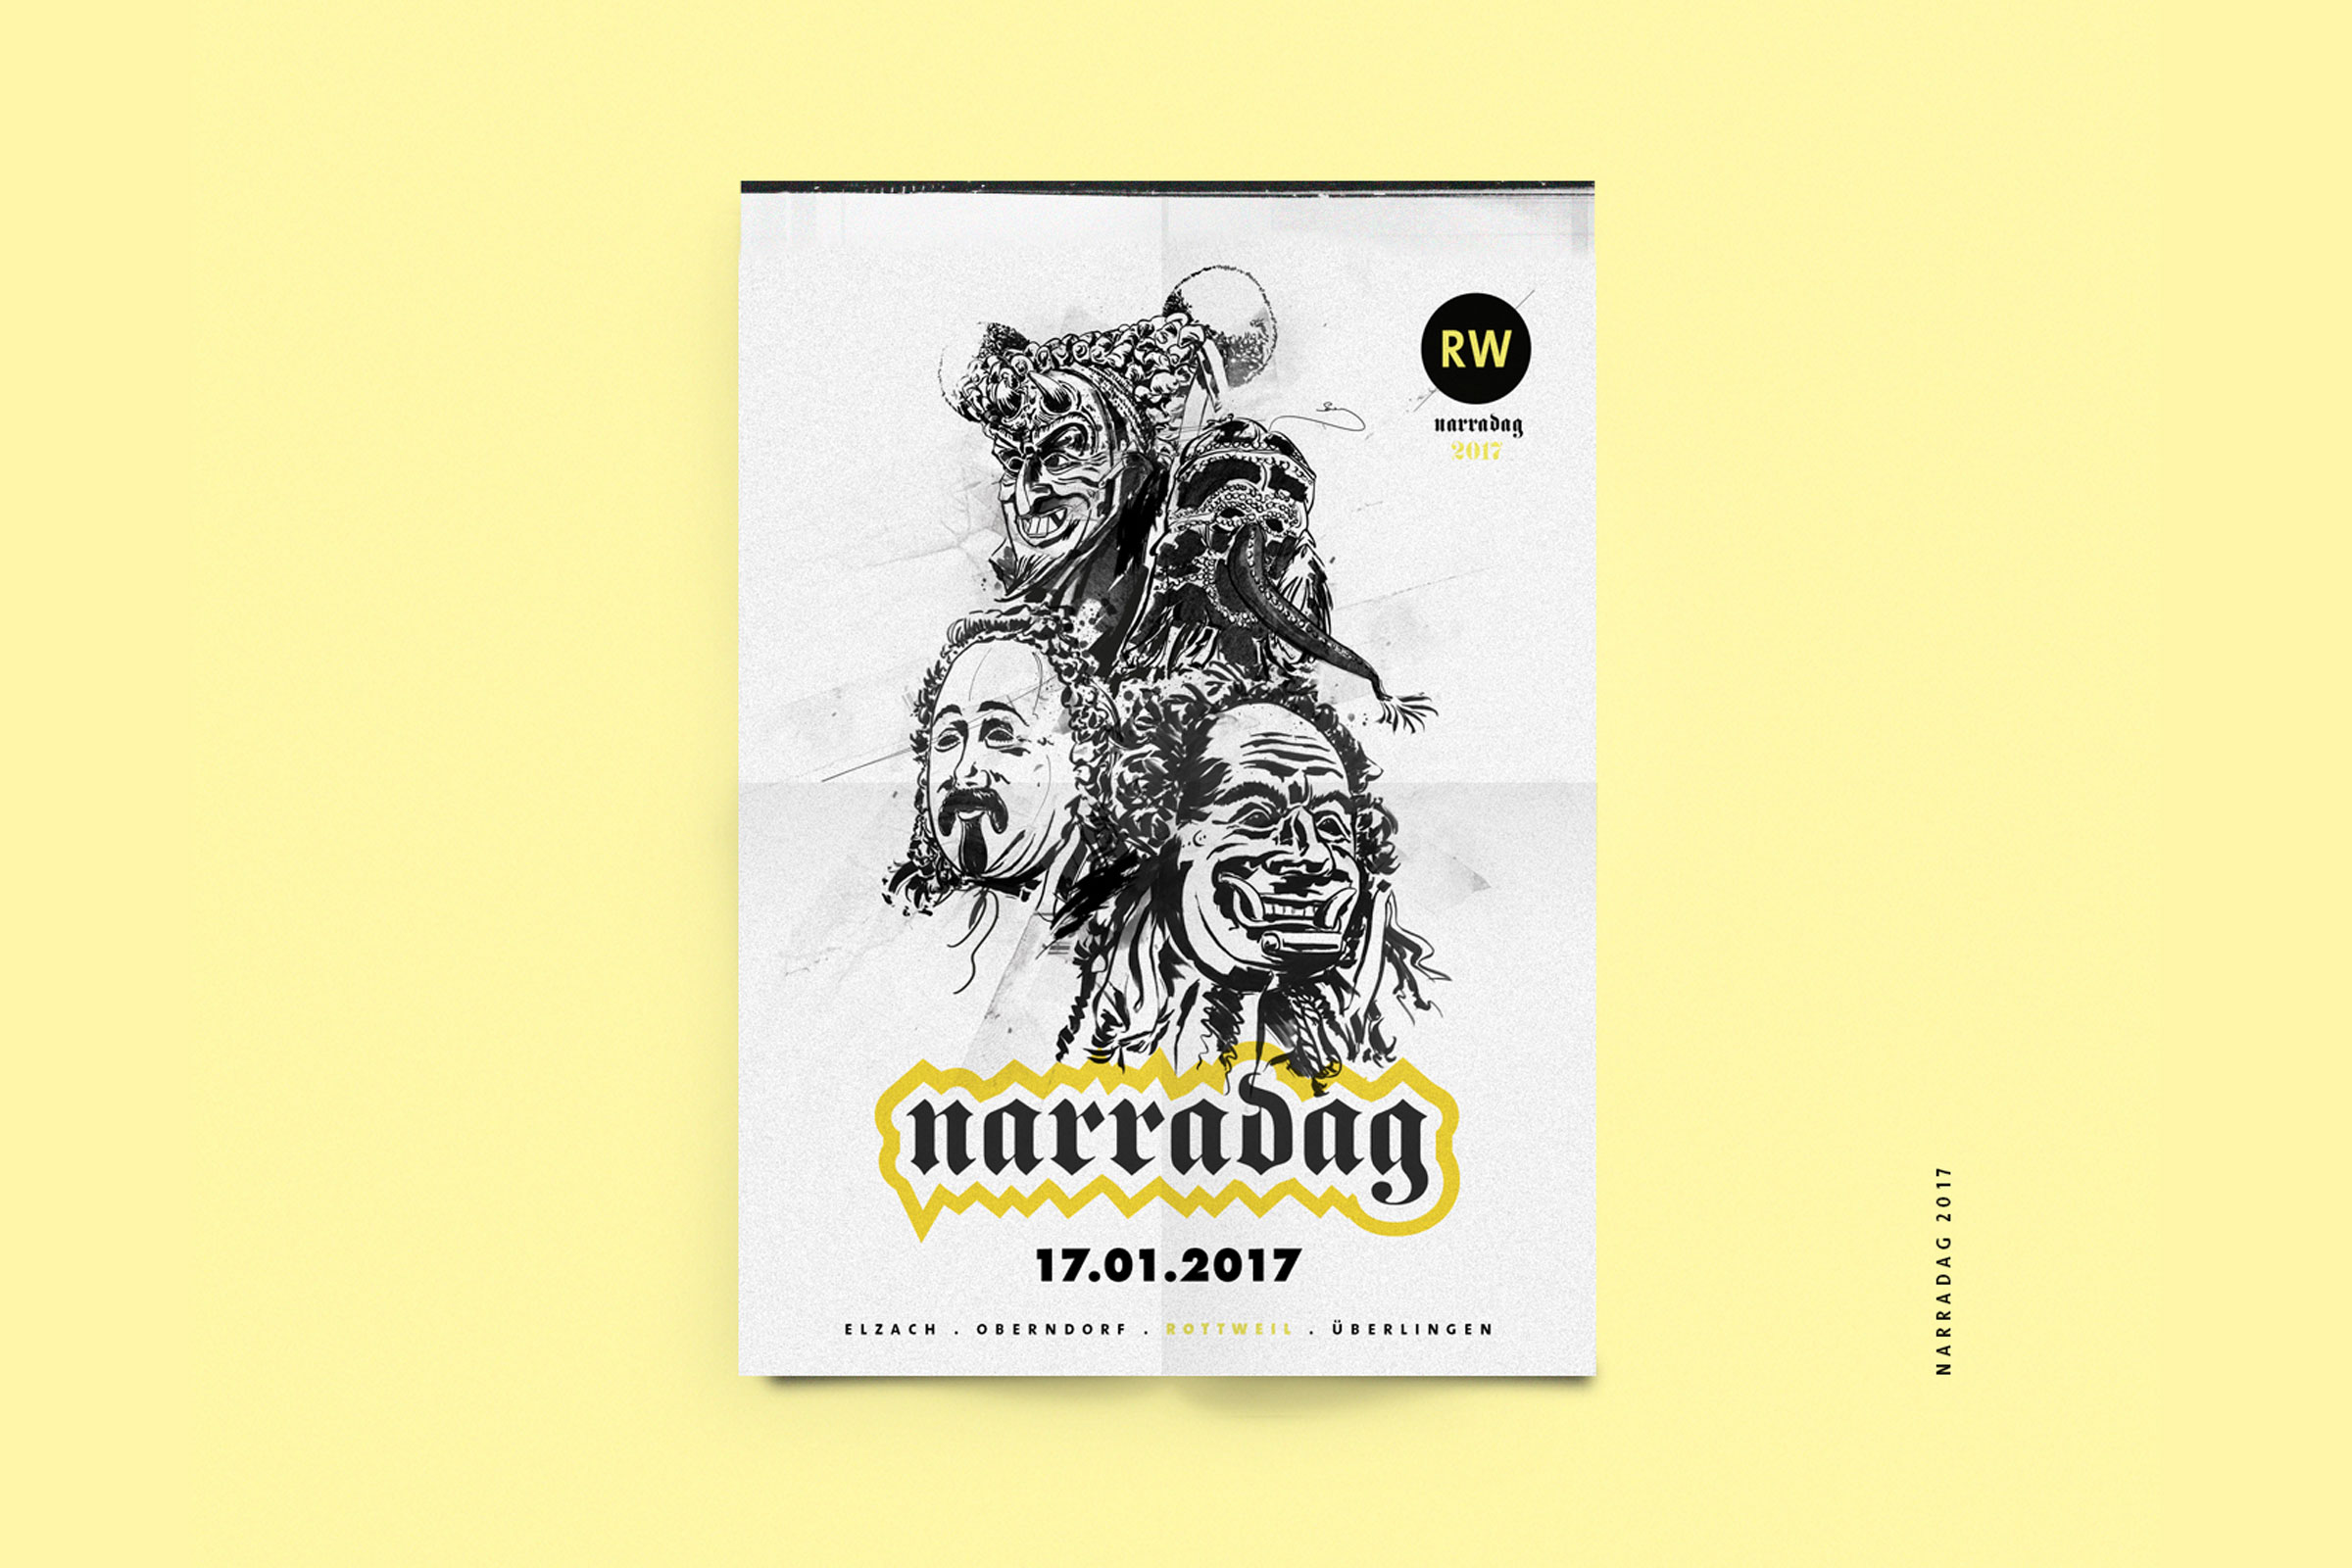 Narradag-2